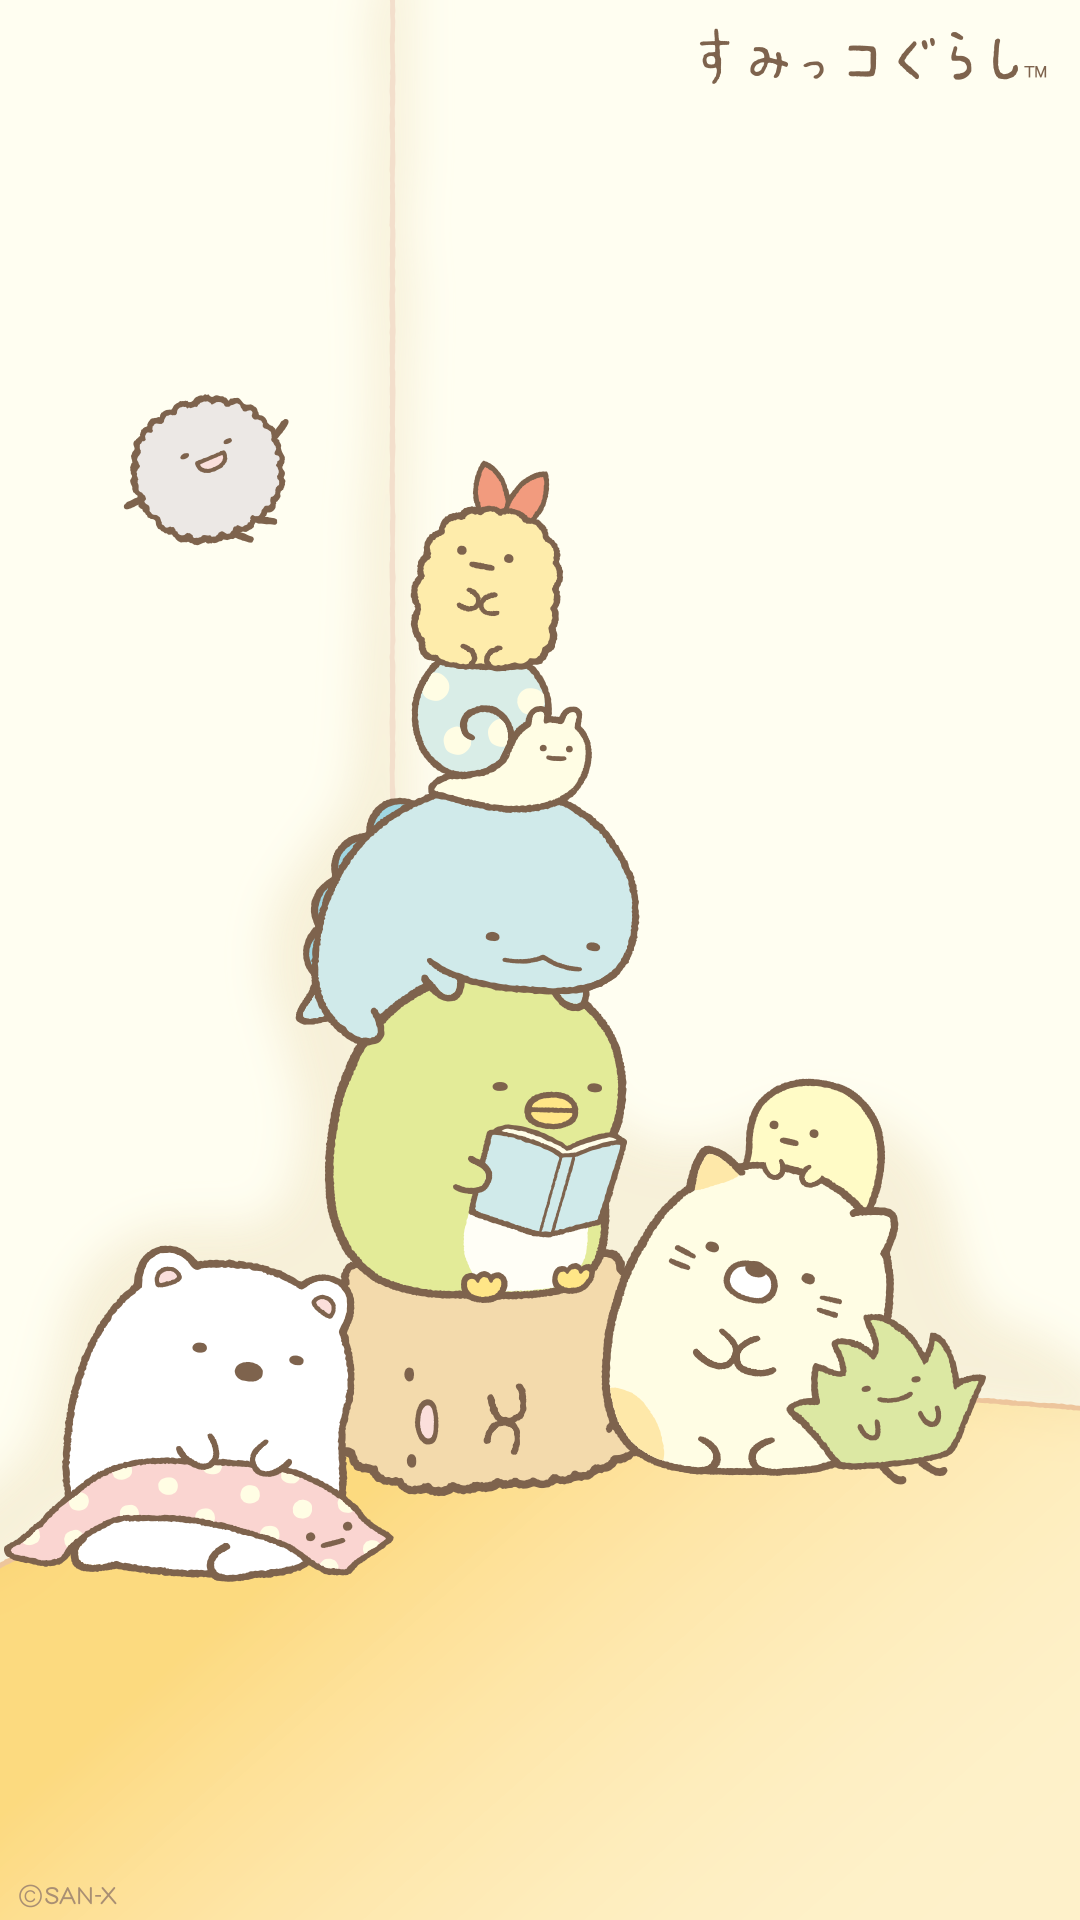 Corner life | Cute Smartphone wallpaper | iPhone Wallpapers